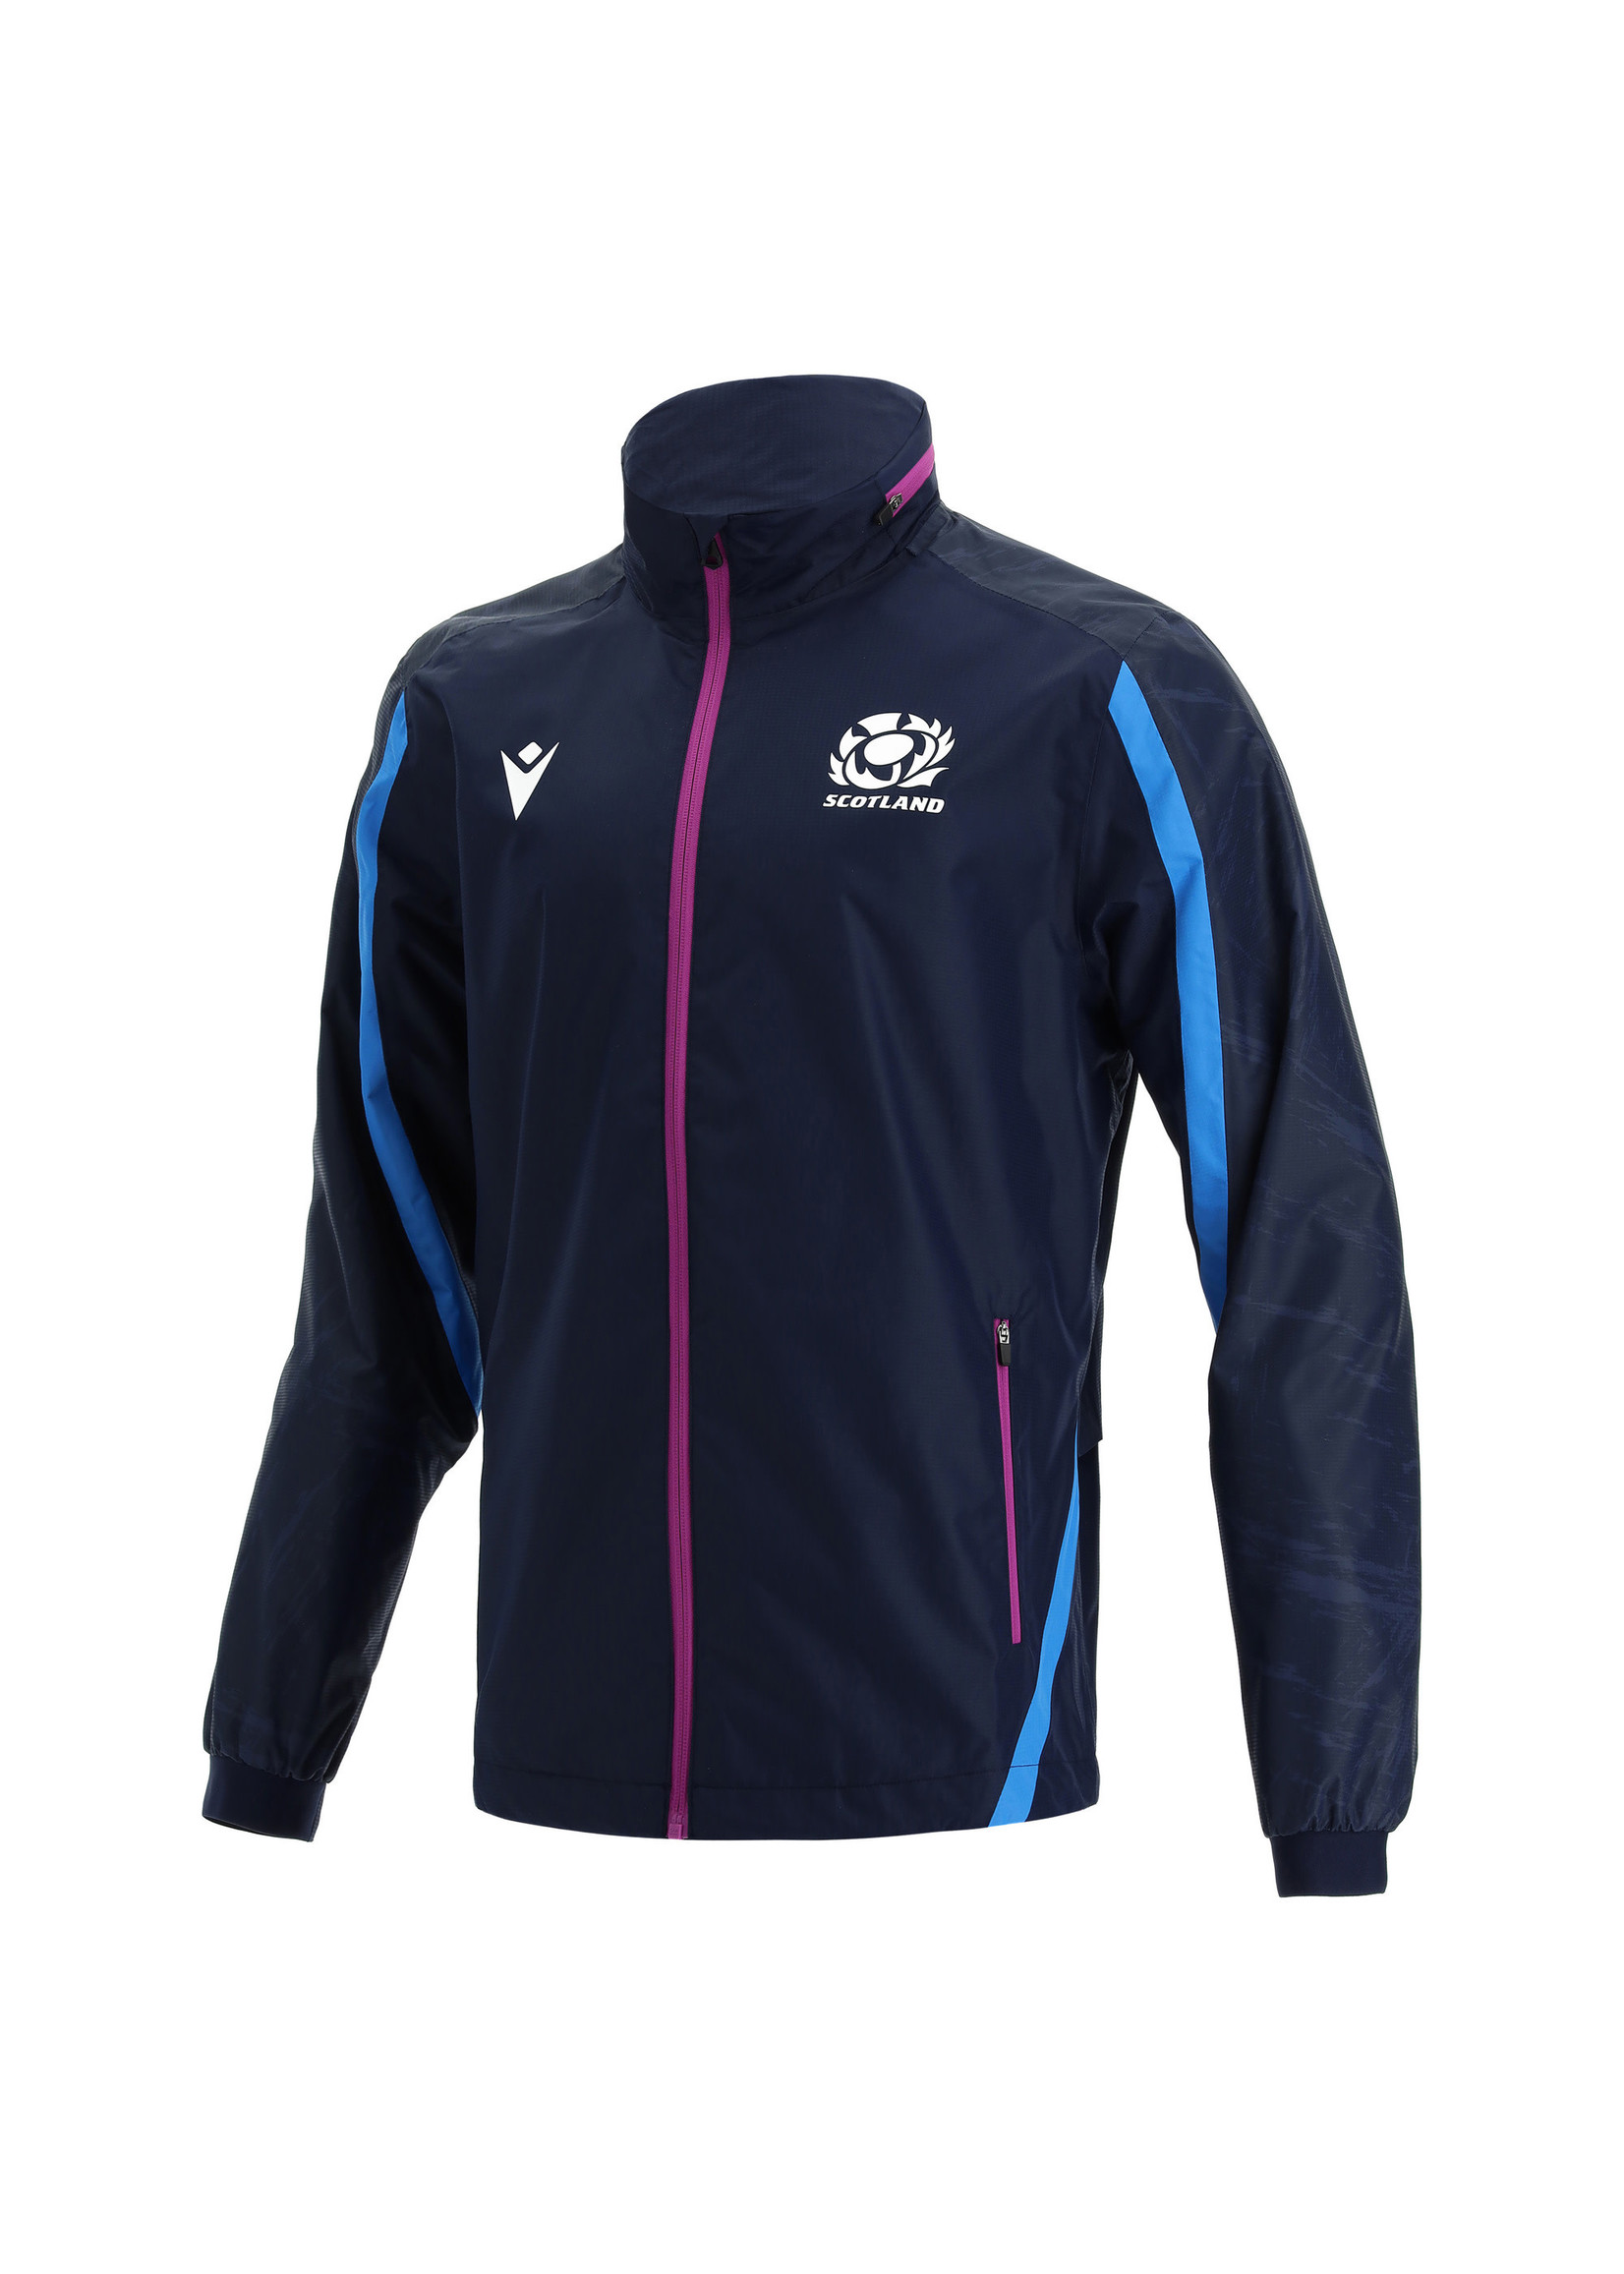 Macron Macron Scotland Rugby - Full Zip Waterproof Jacket (2021/22)